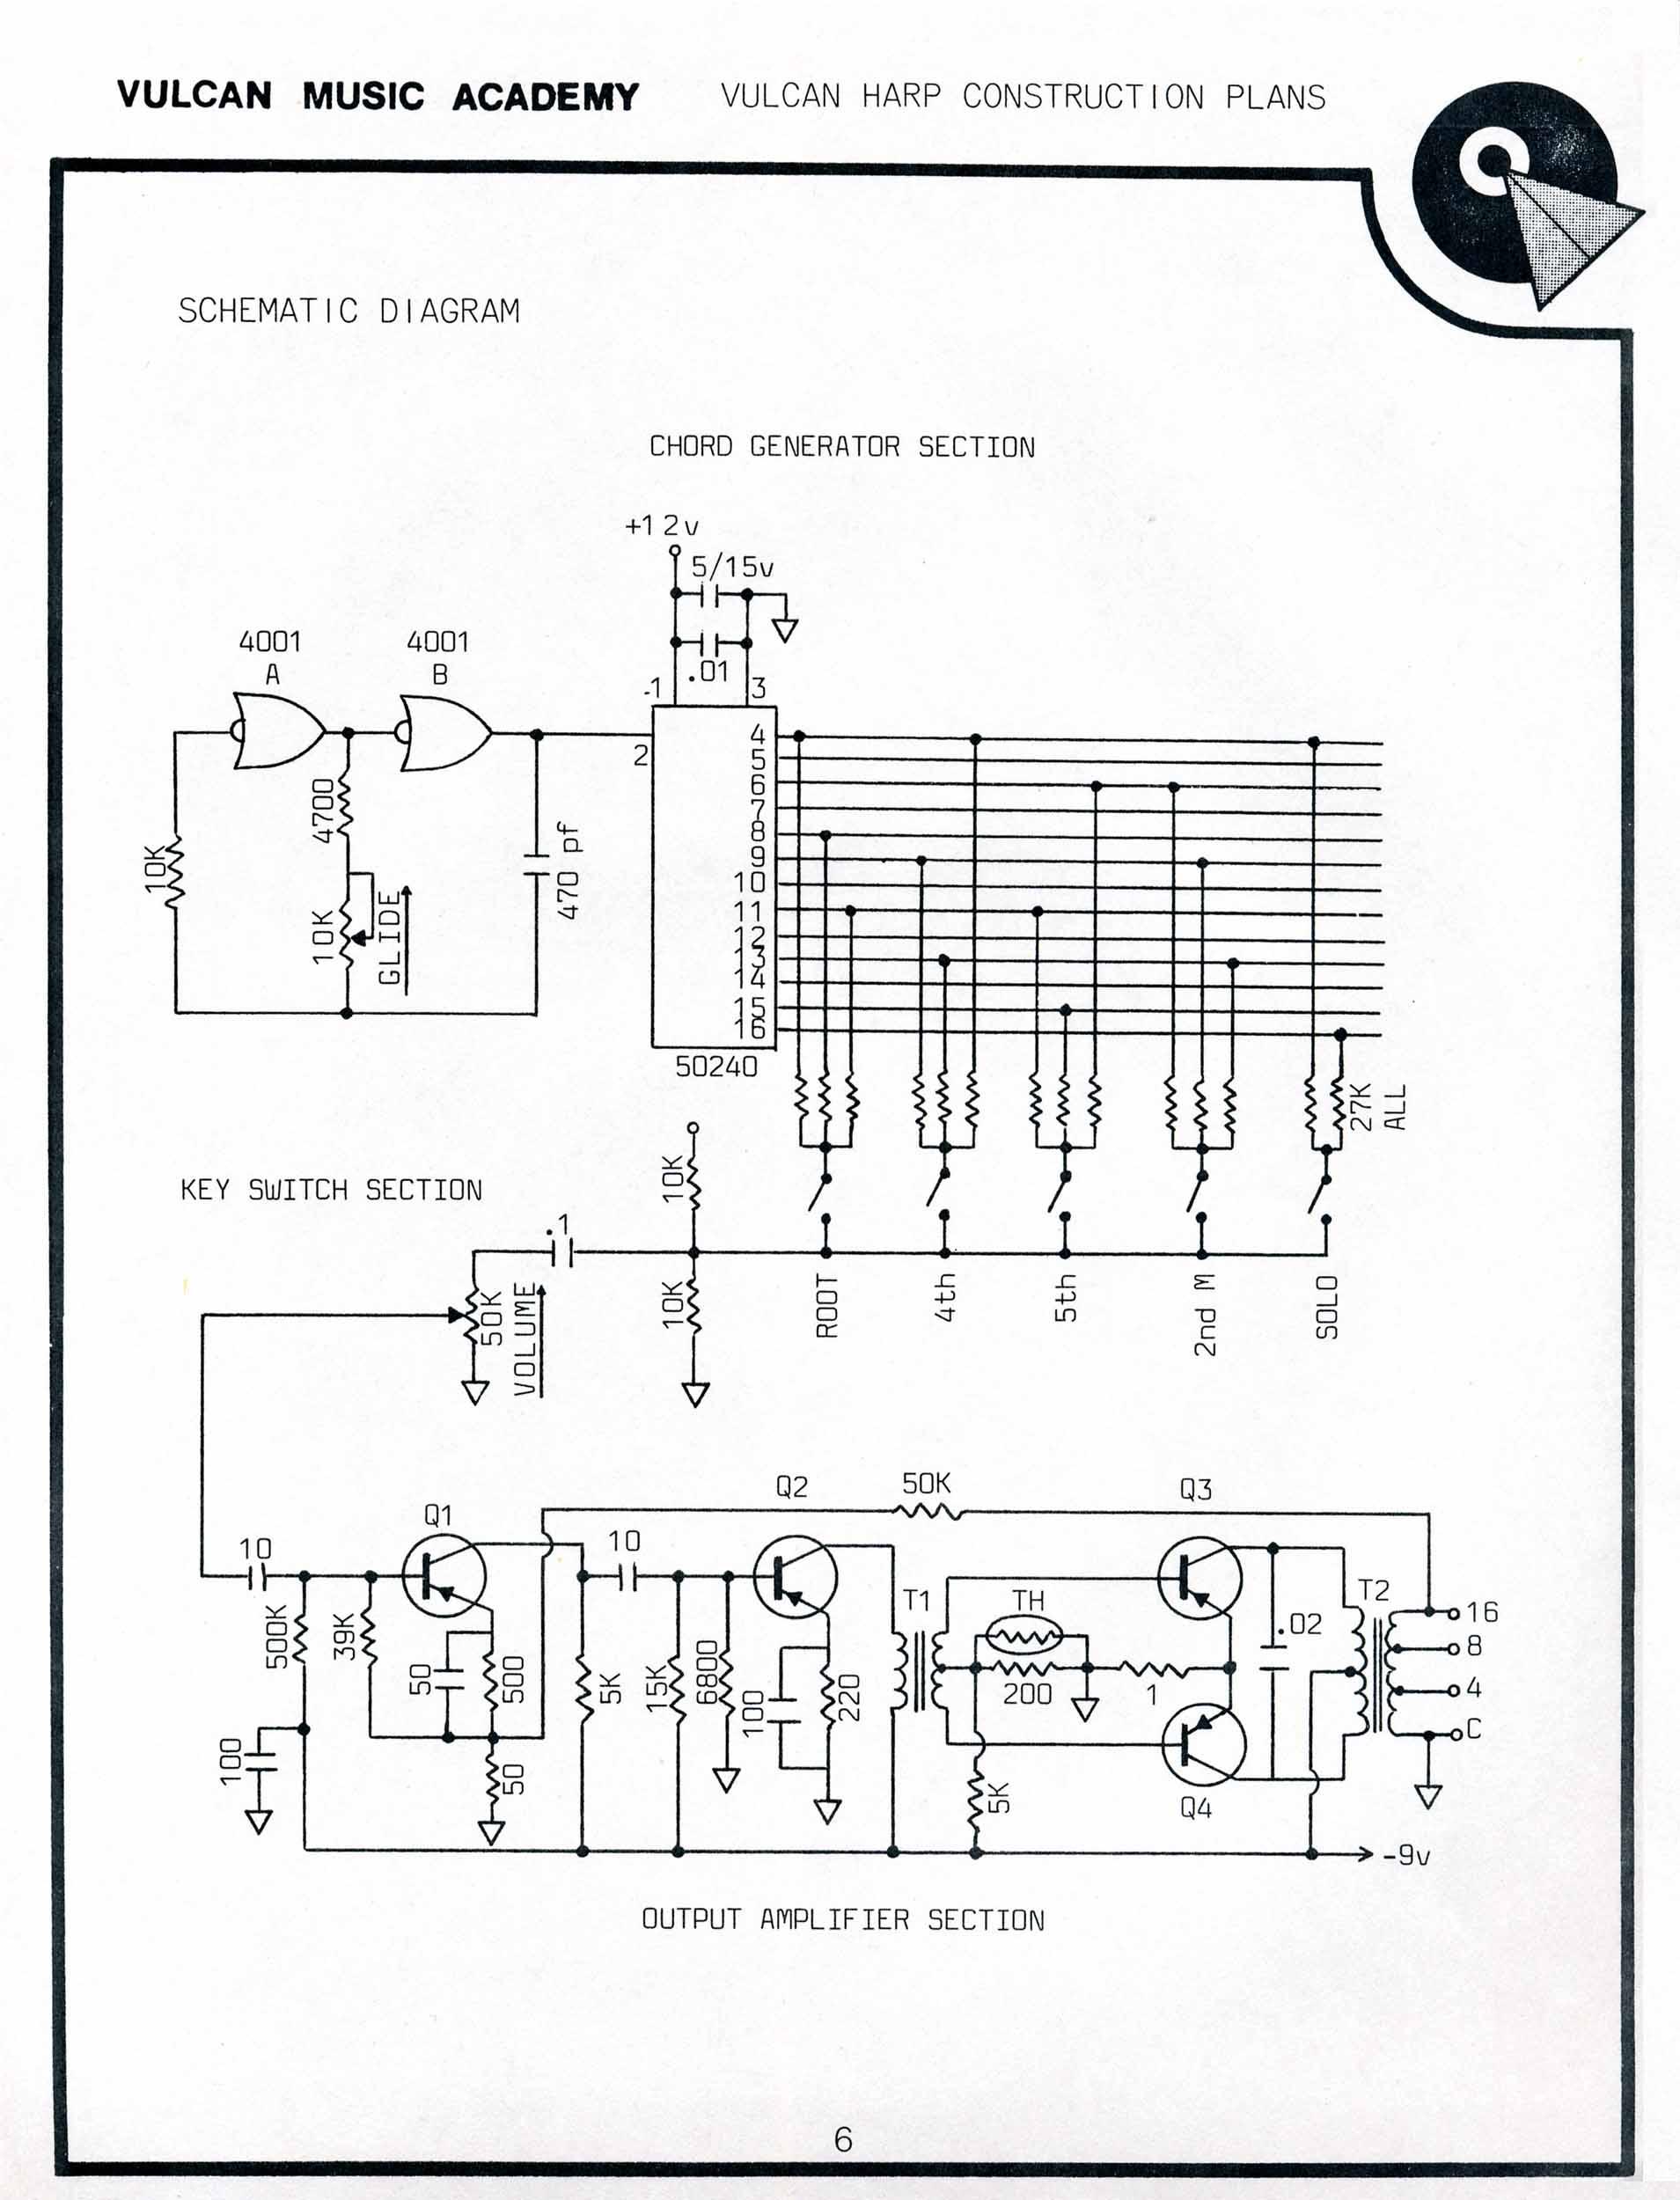 Star Trek Blueprints: Vulcan Harp Construction Plans